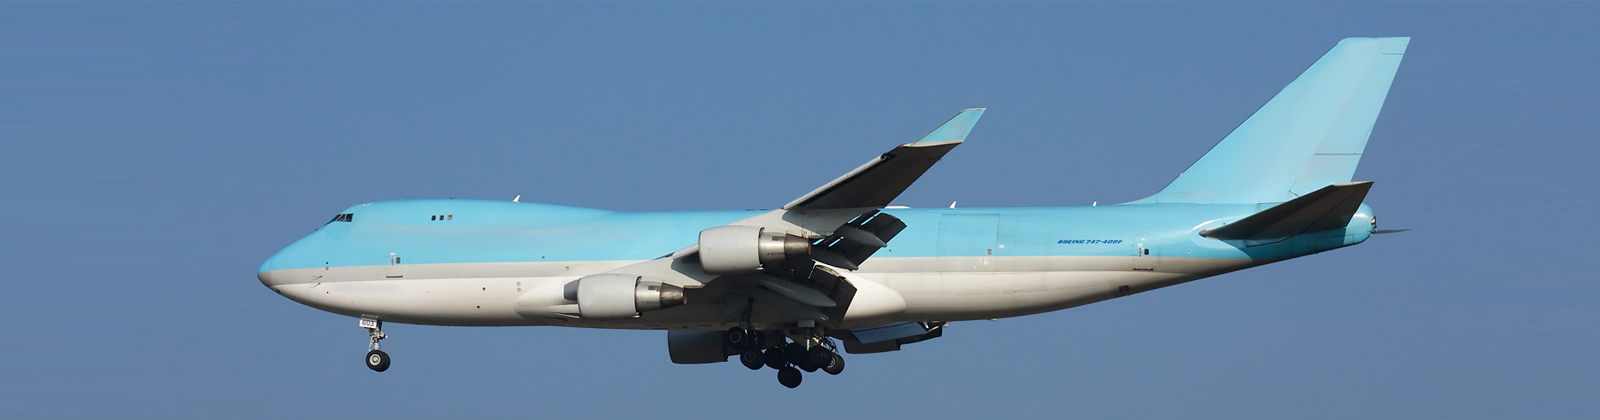 Aircraft-Freighters-Cargo Sales | Aero Parts USA